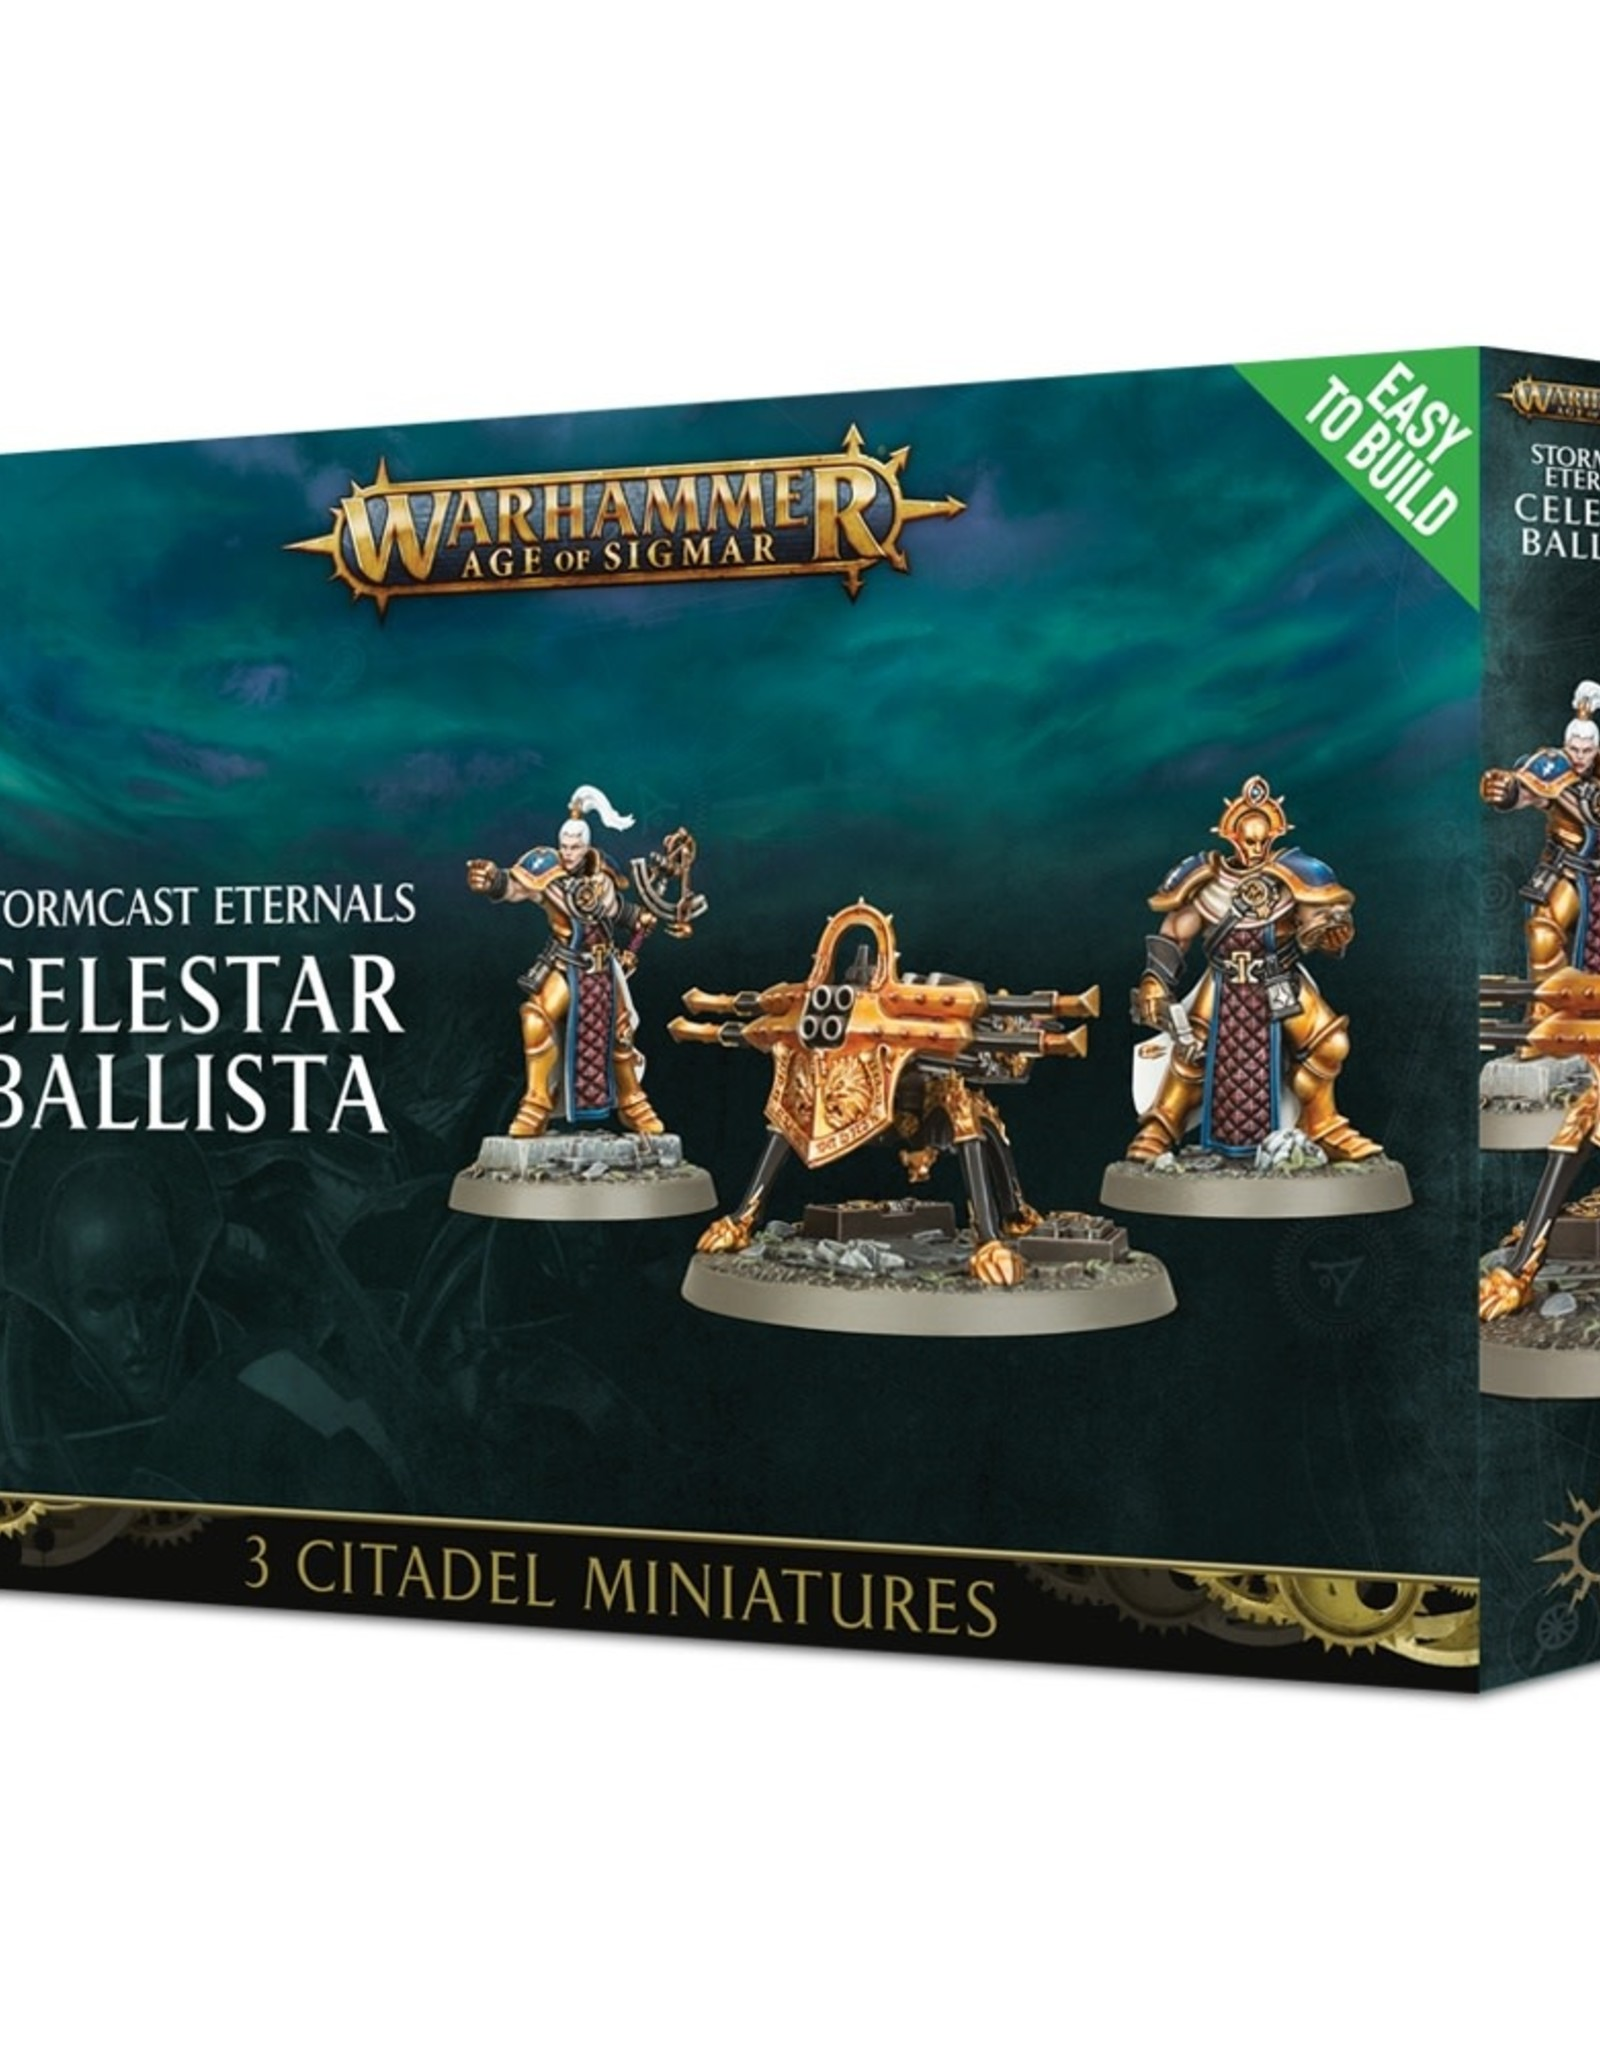 Age of Sigmar ETB: Stormcast Eternals Celestar Ballista